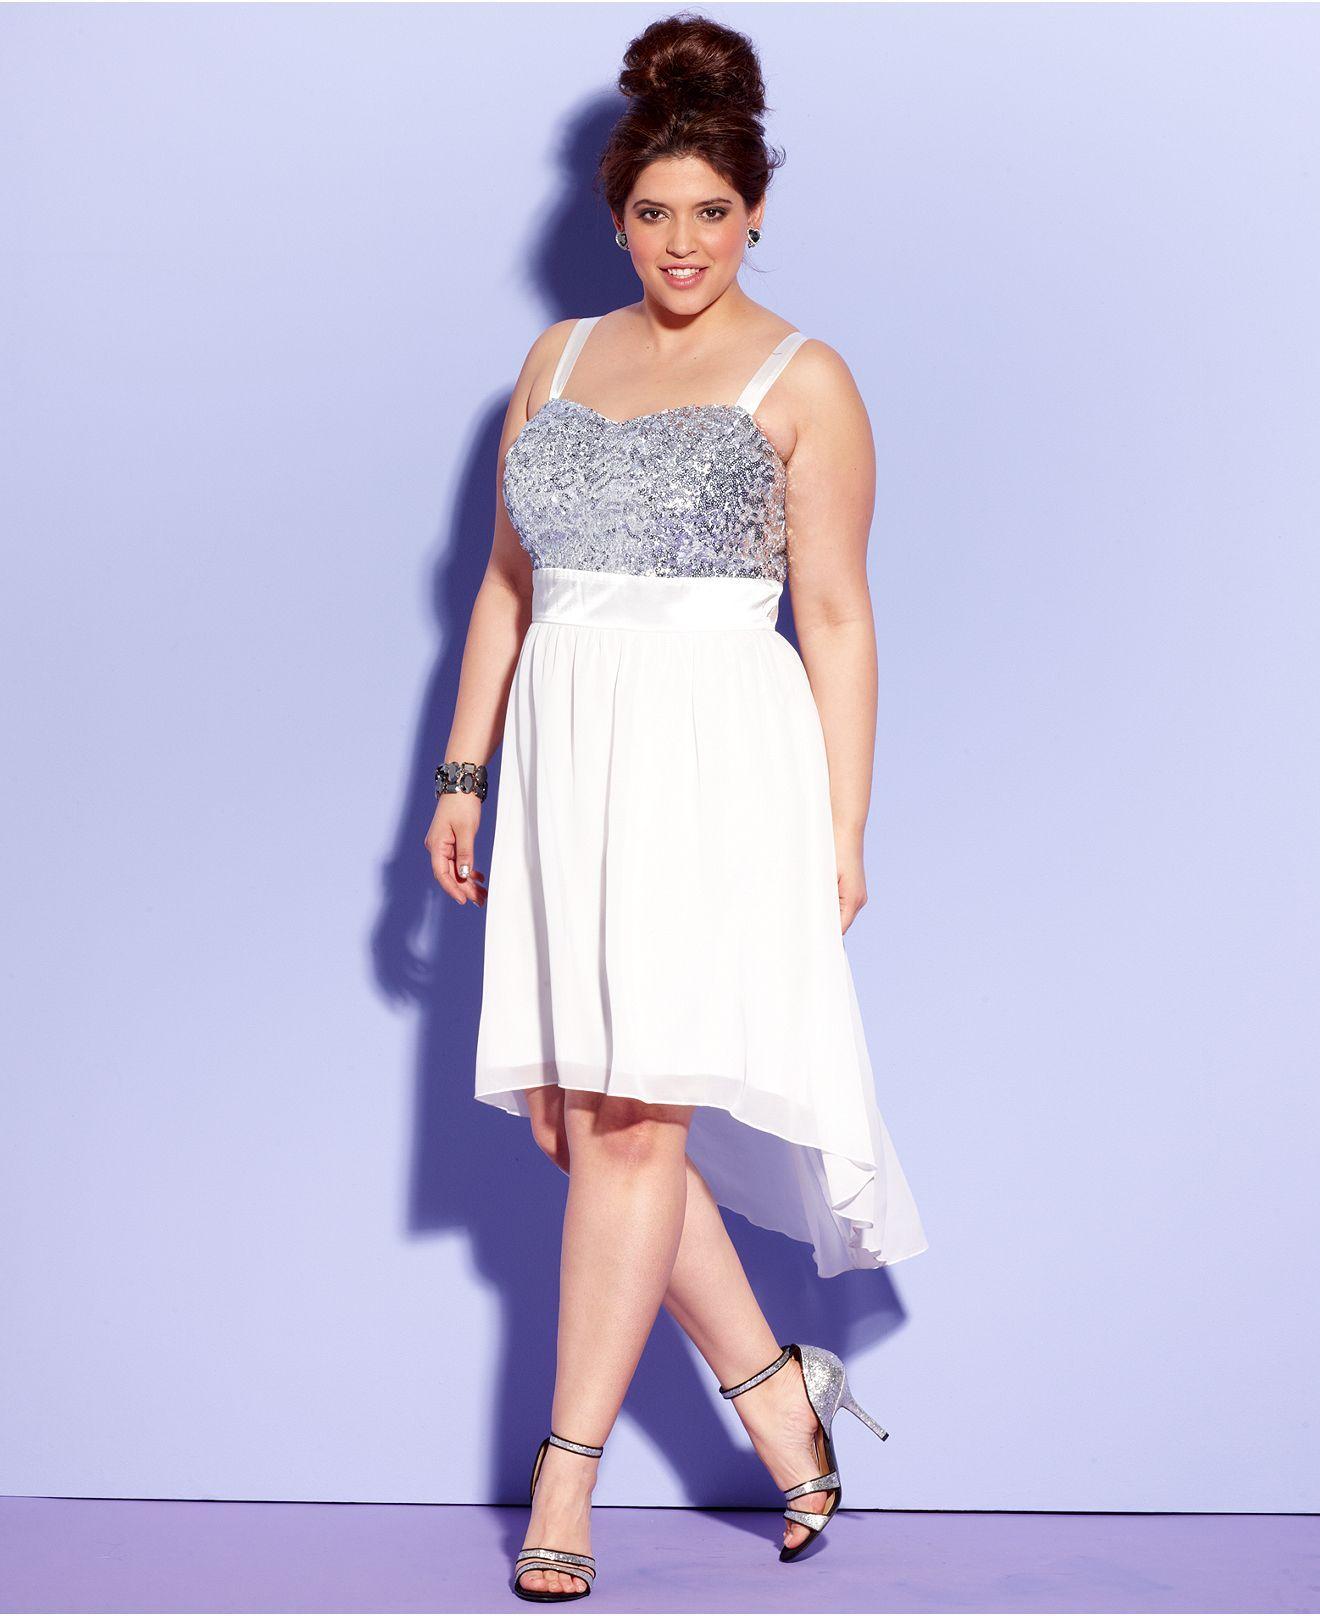 macys prom dresses plus size - Heart.impulsar.co